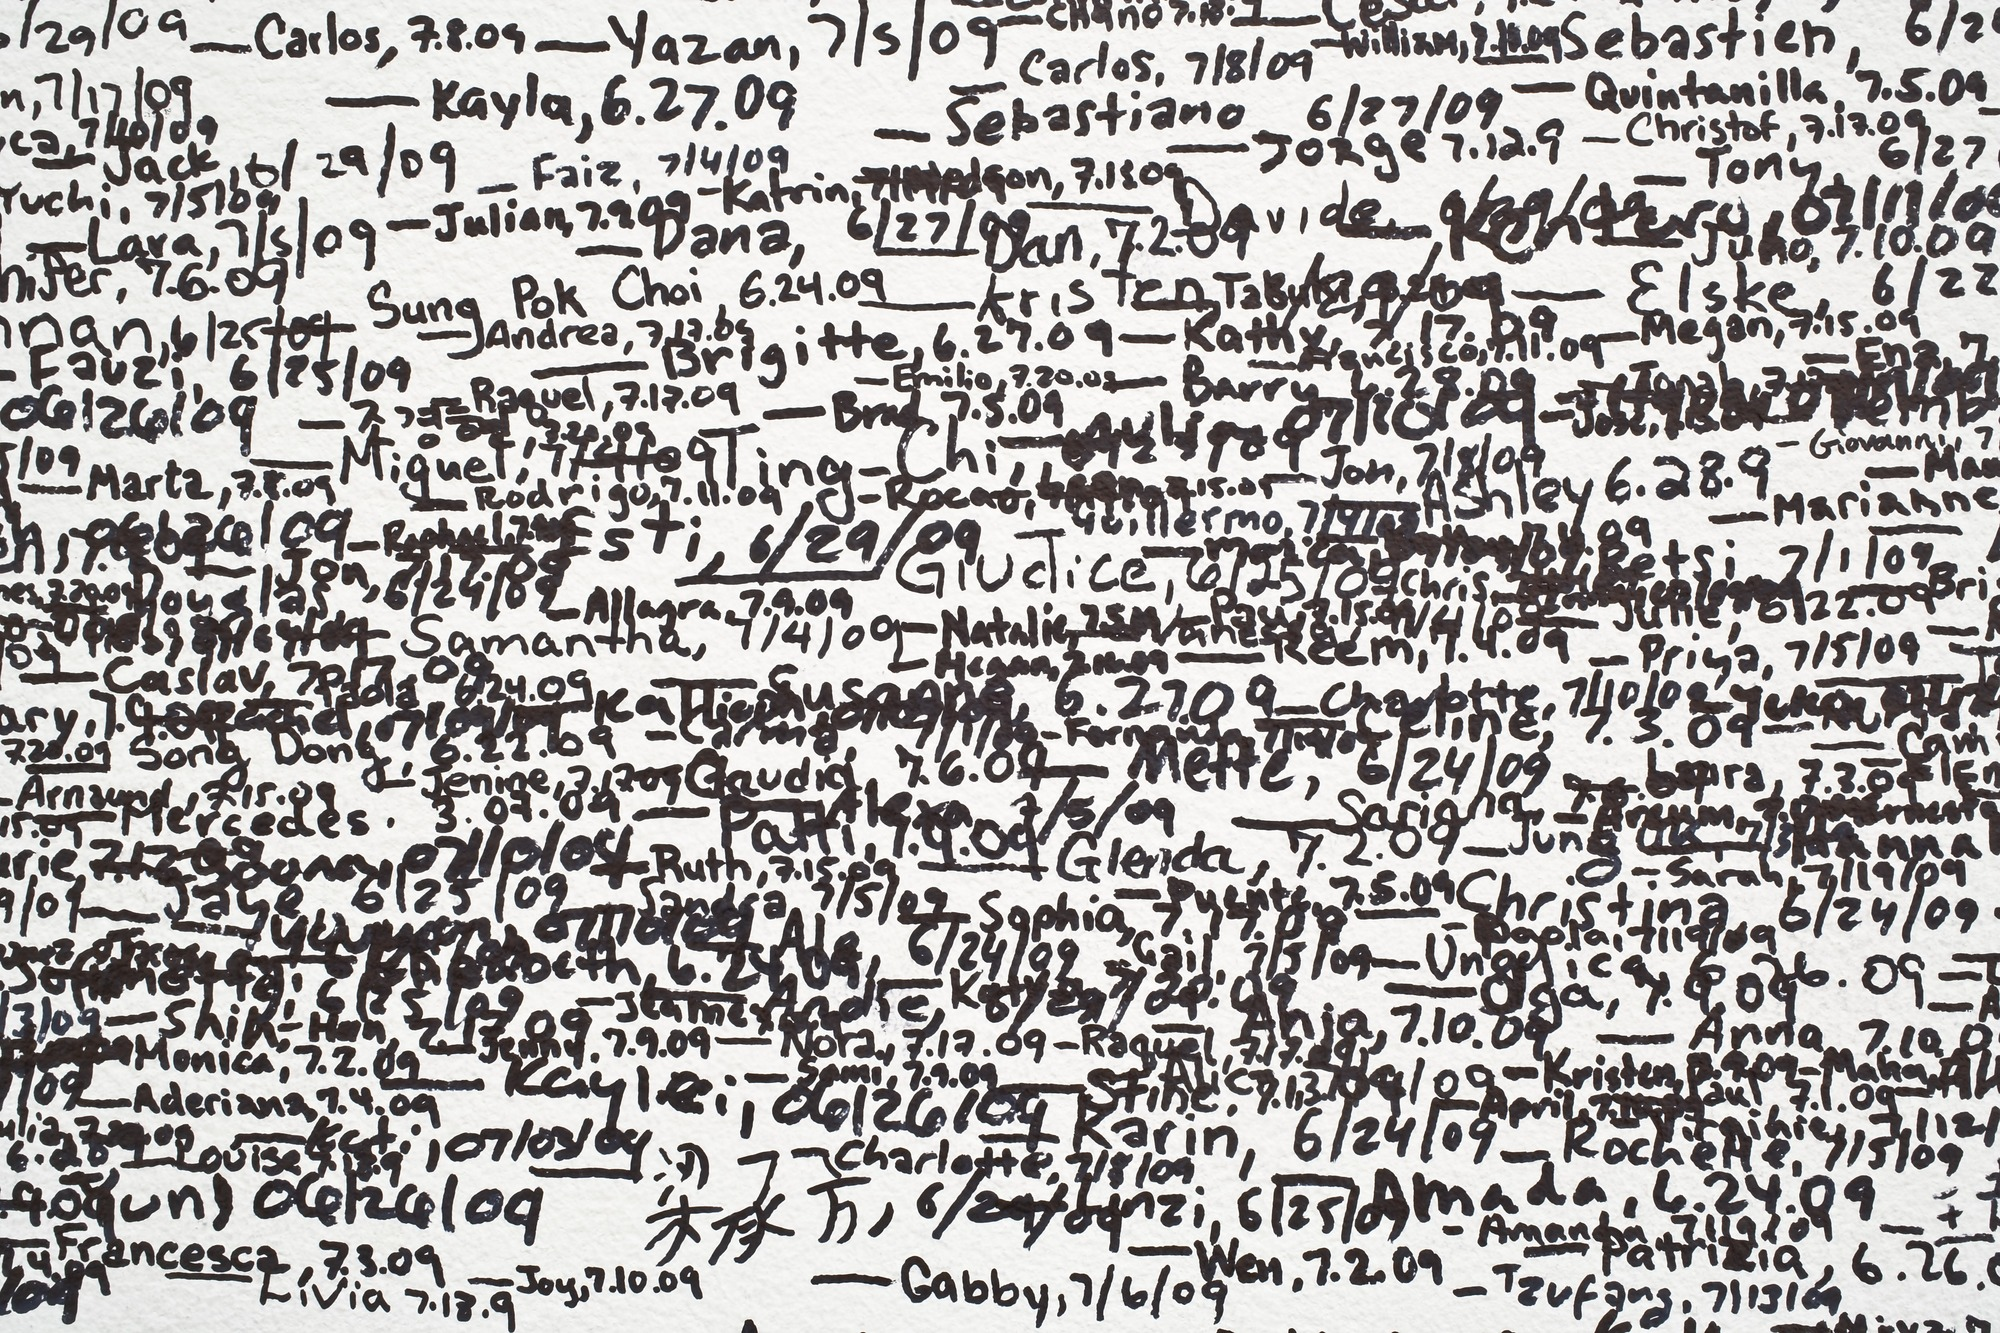 Roman Ondak, Measuring the Universe, MoMA, New York (2007)